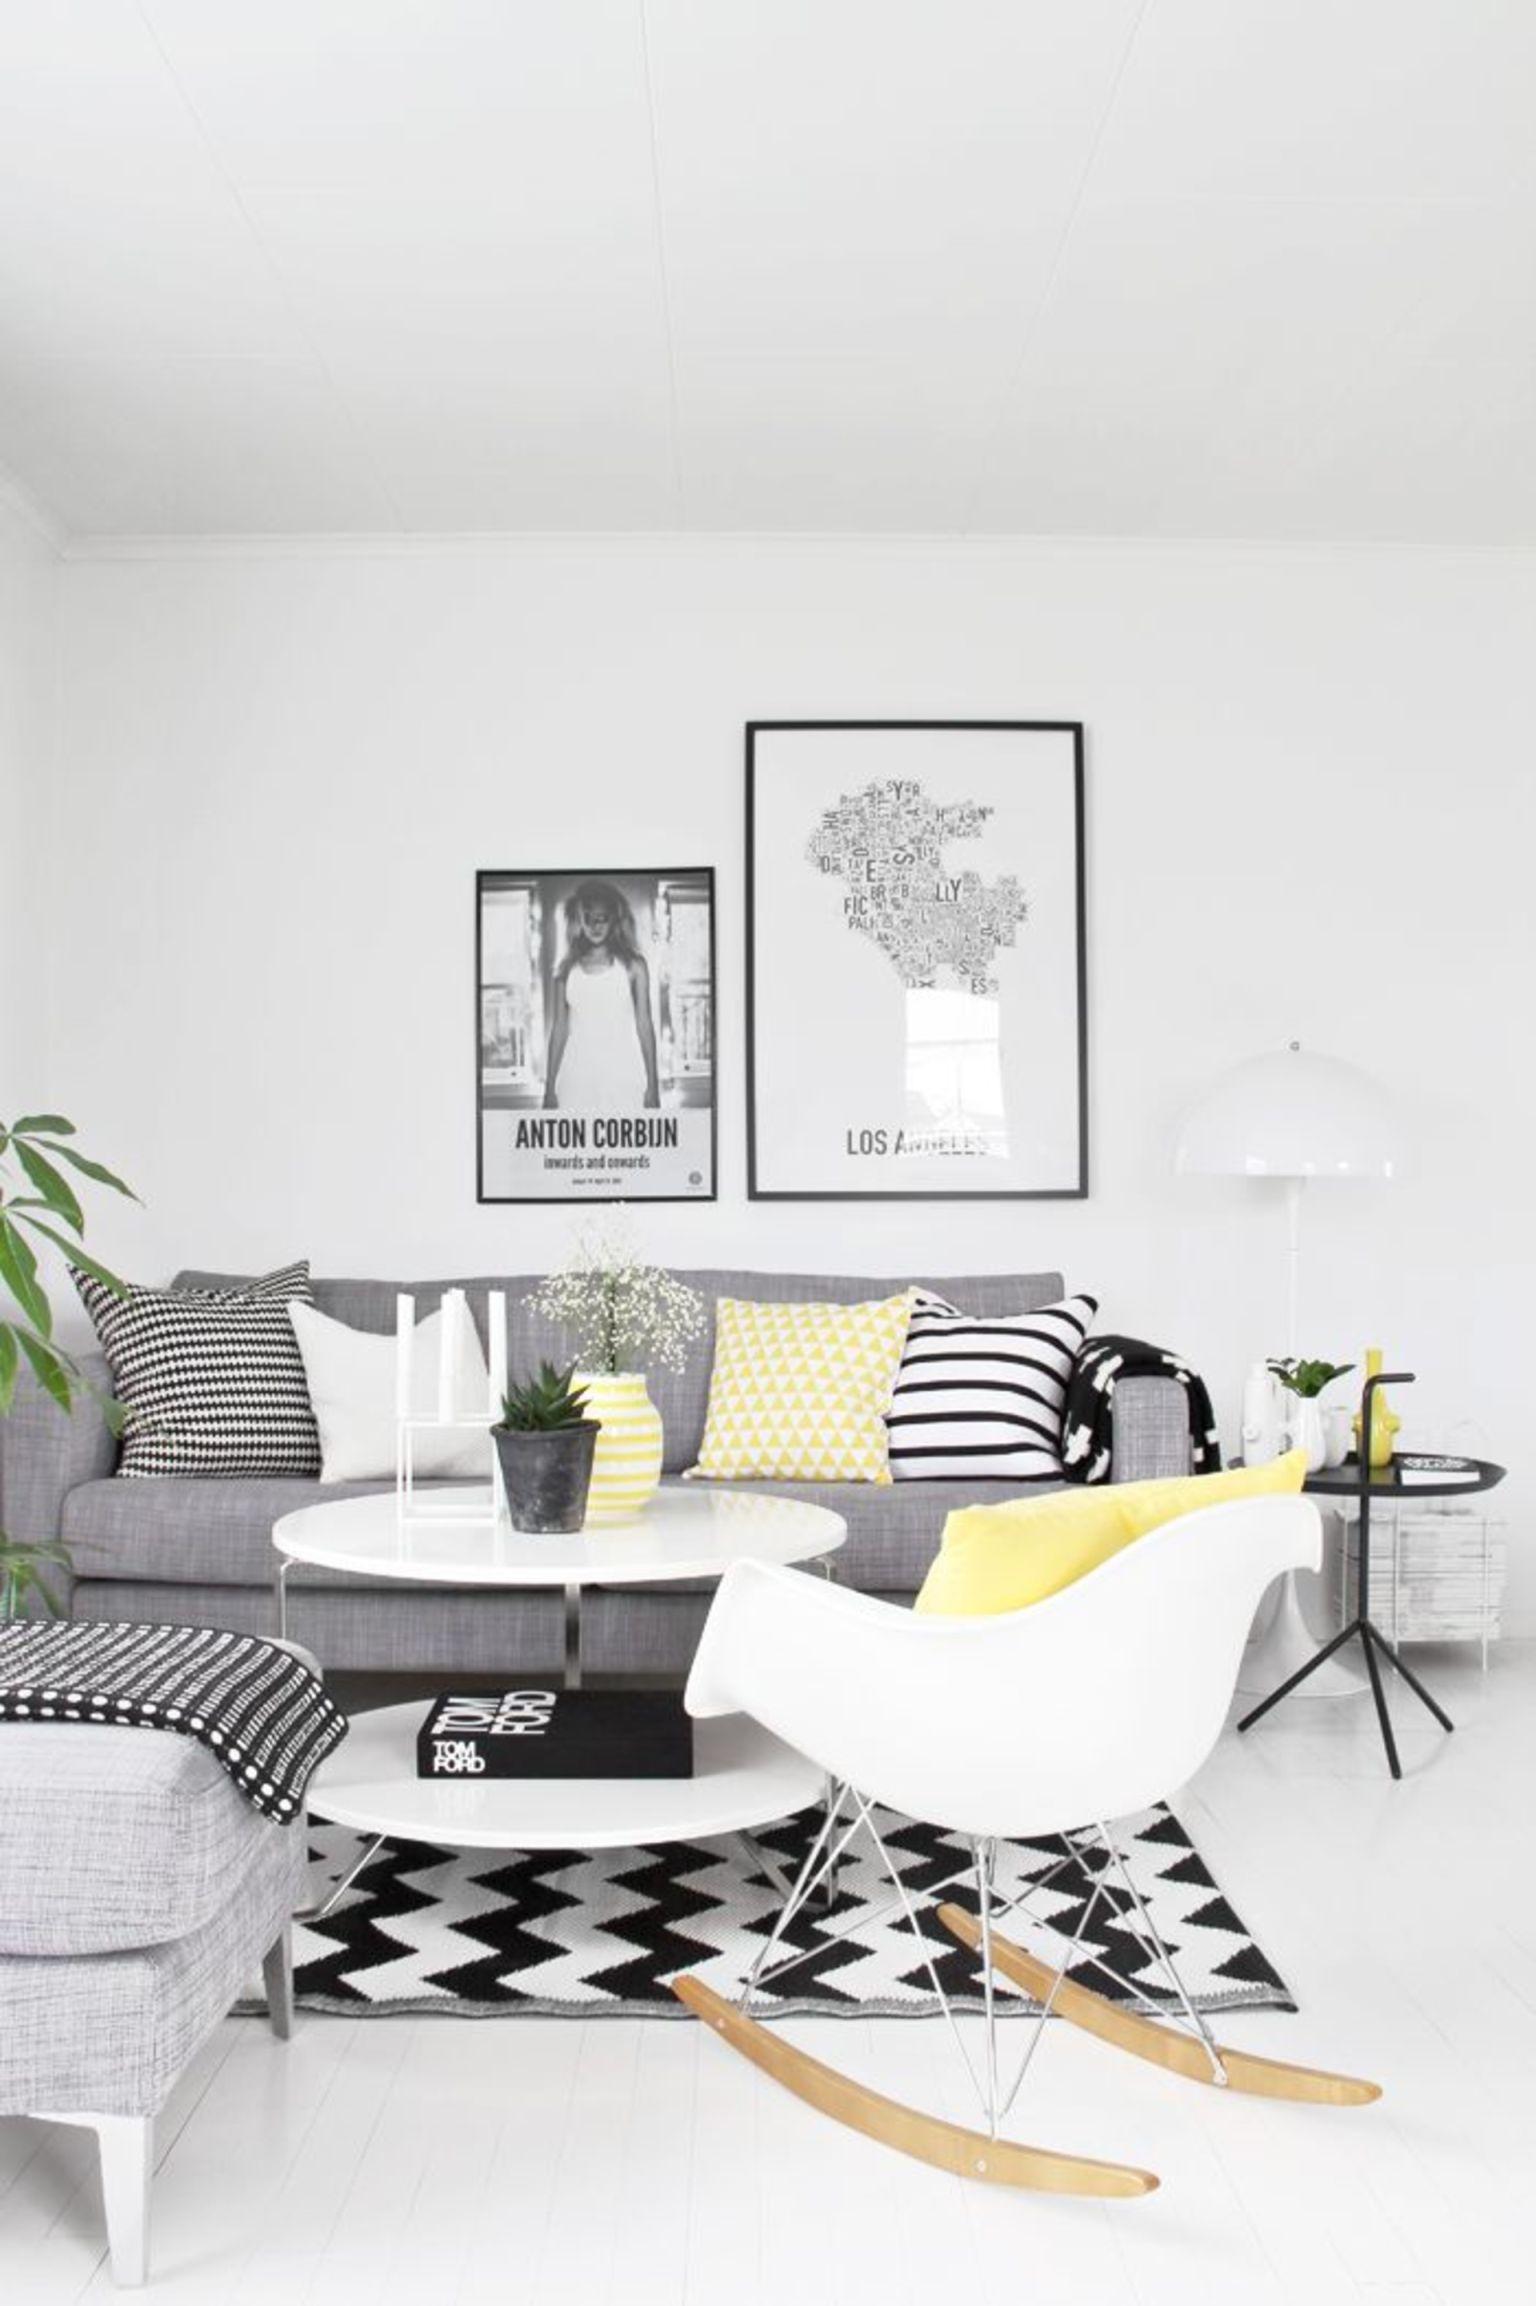 50 Small Living Room Ideas thewowdecor (36)